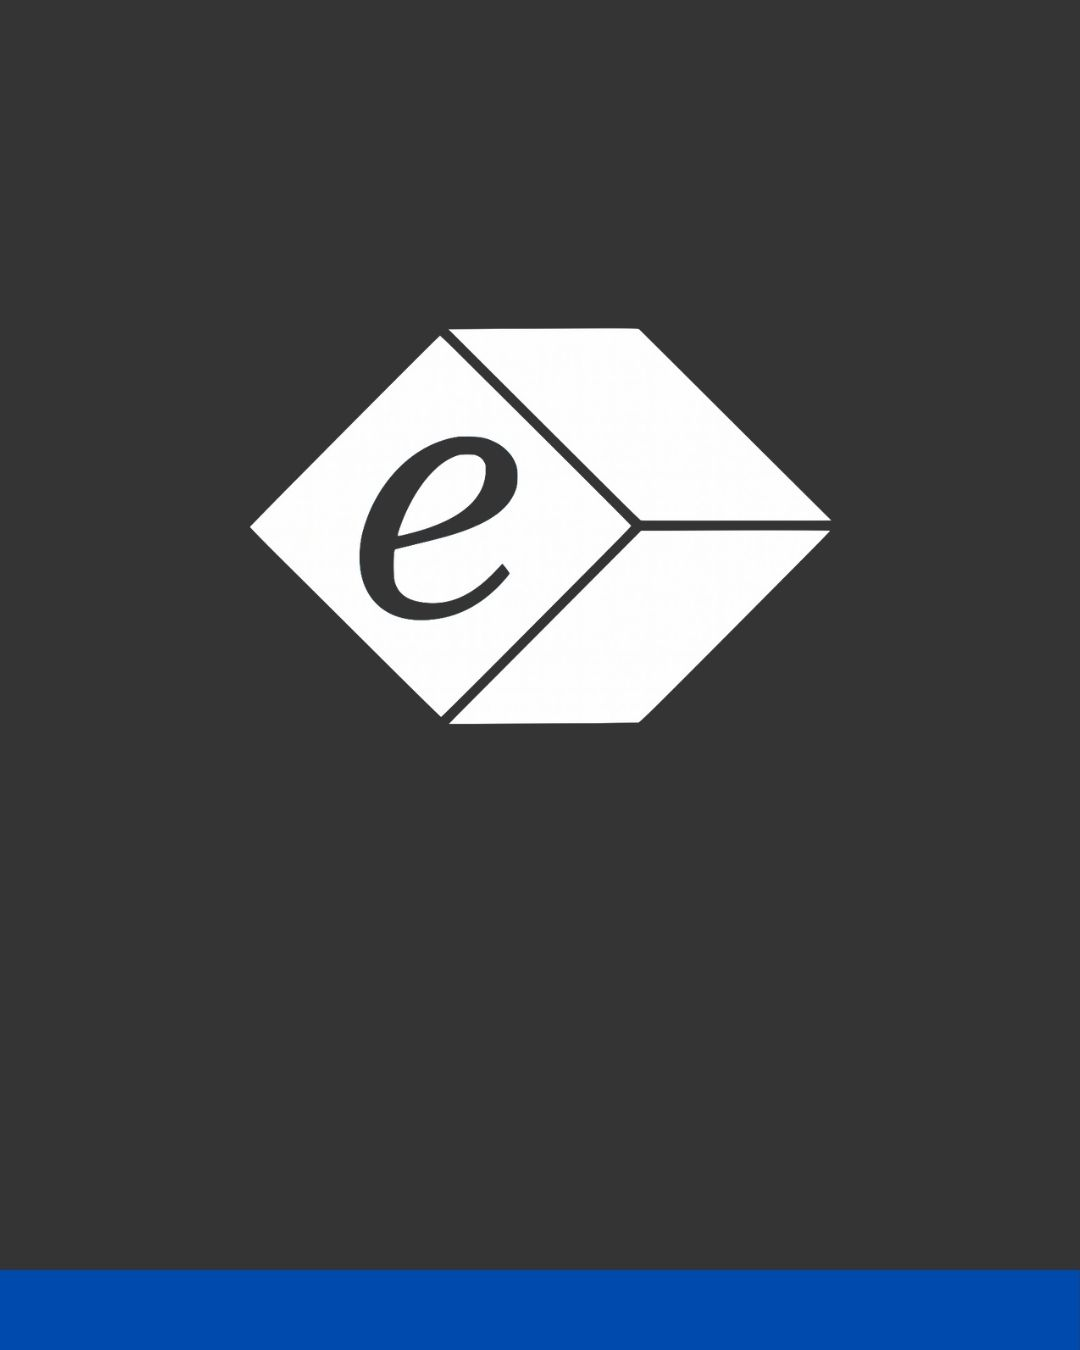 Digital Patterns Intro 1